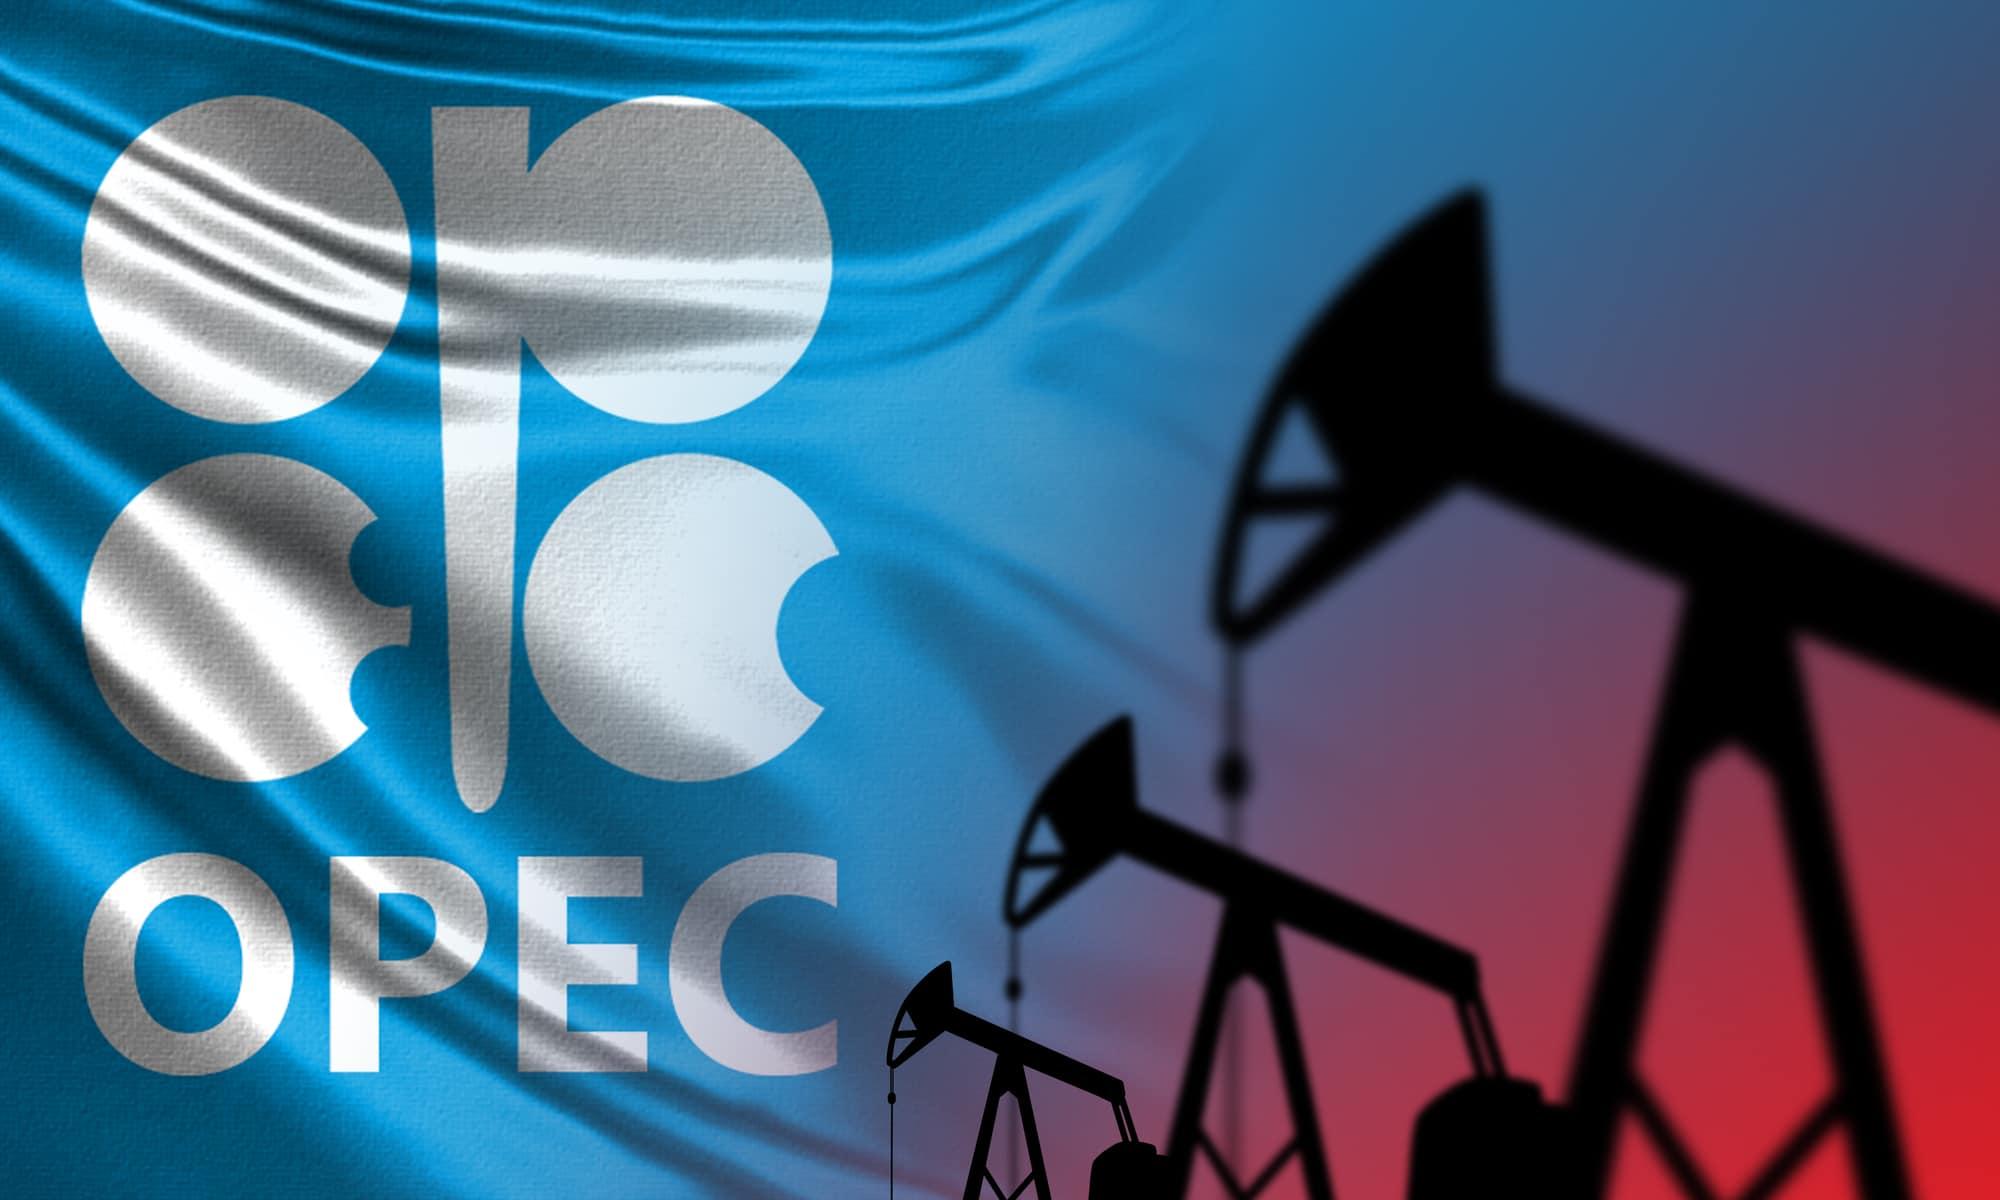 Brent price decreased to $56.16 per barrel